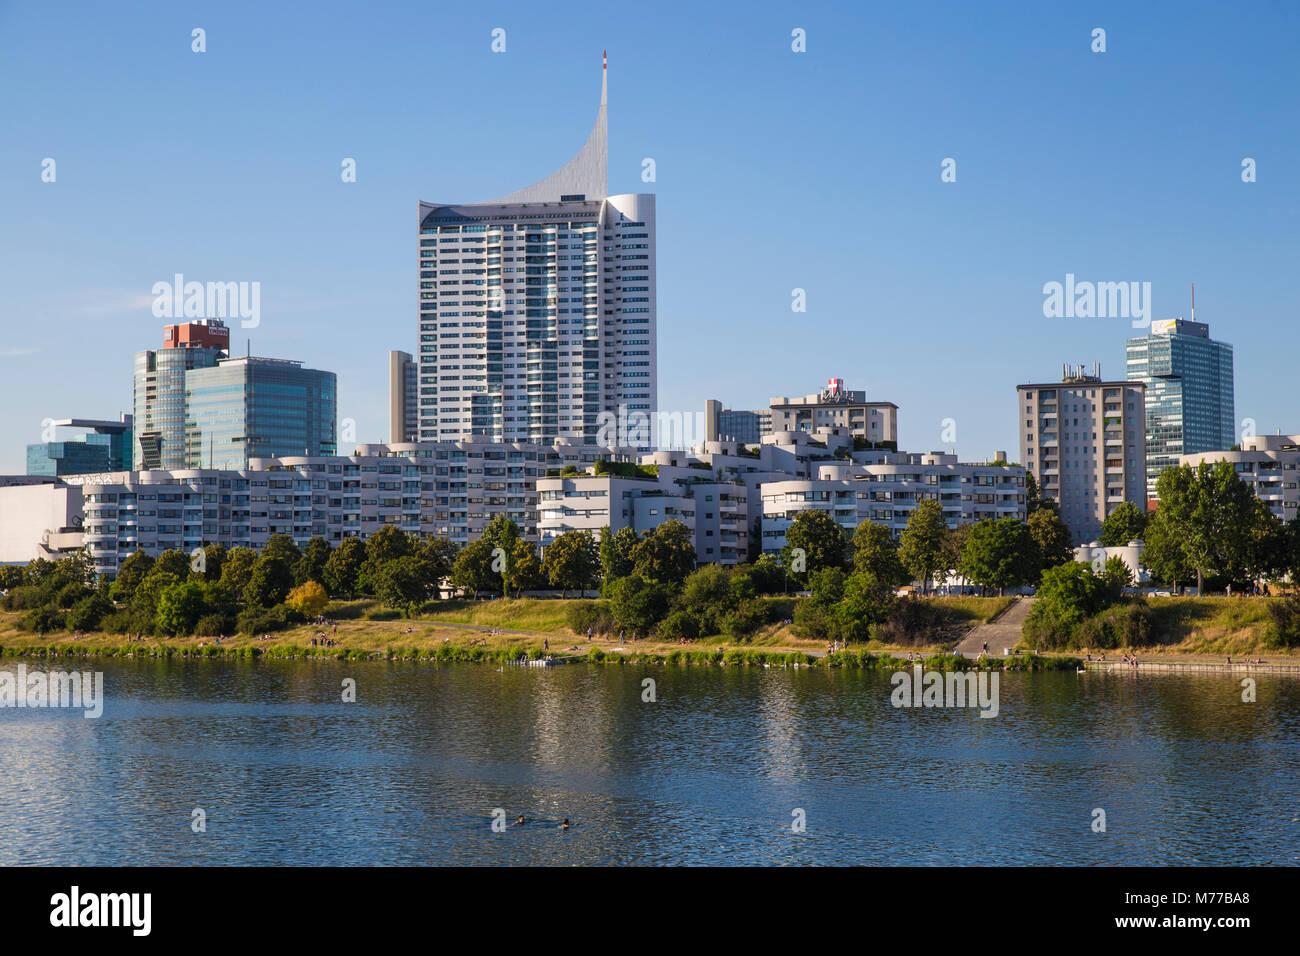 Donau City reflecting in New Danube River, Vienna, Austria, Europe - Stock Image